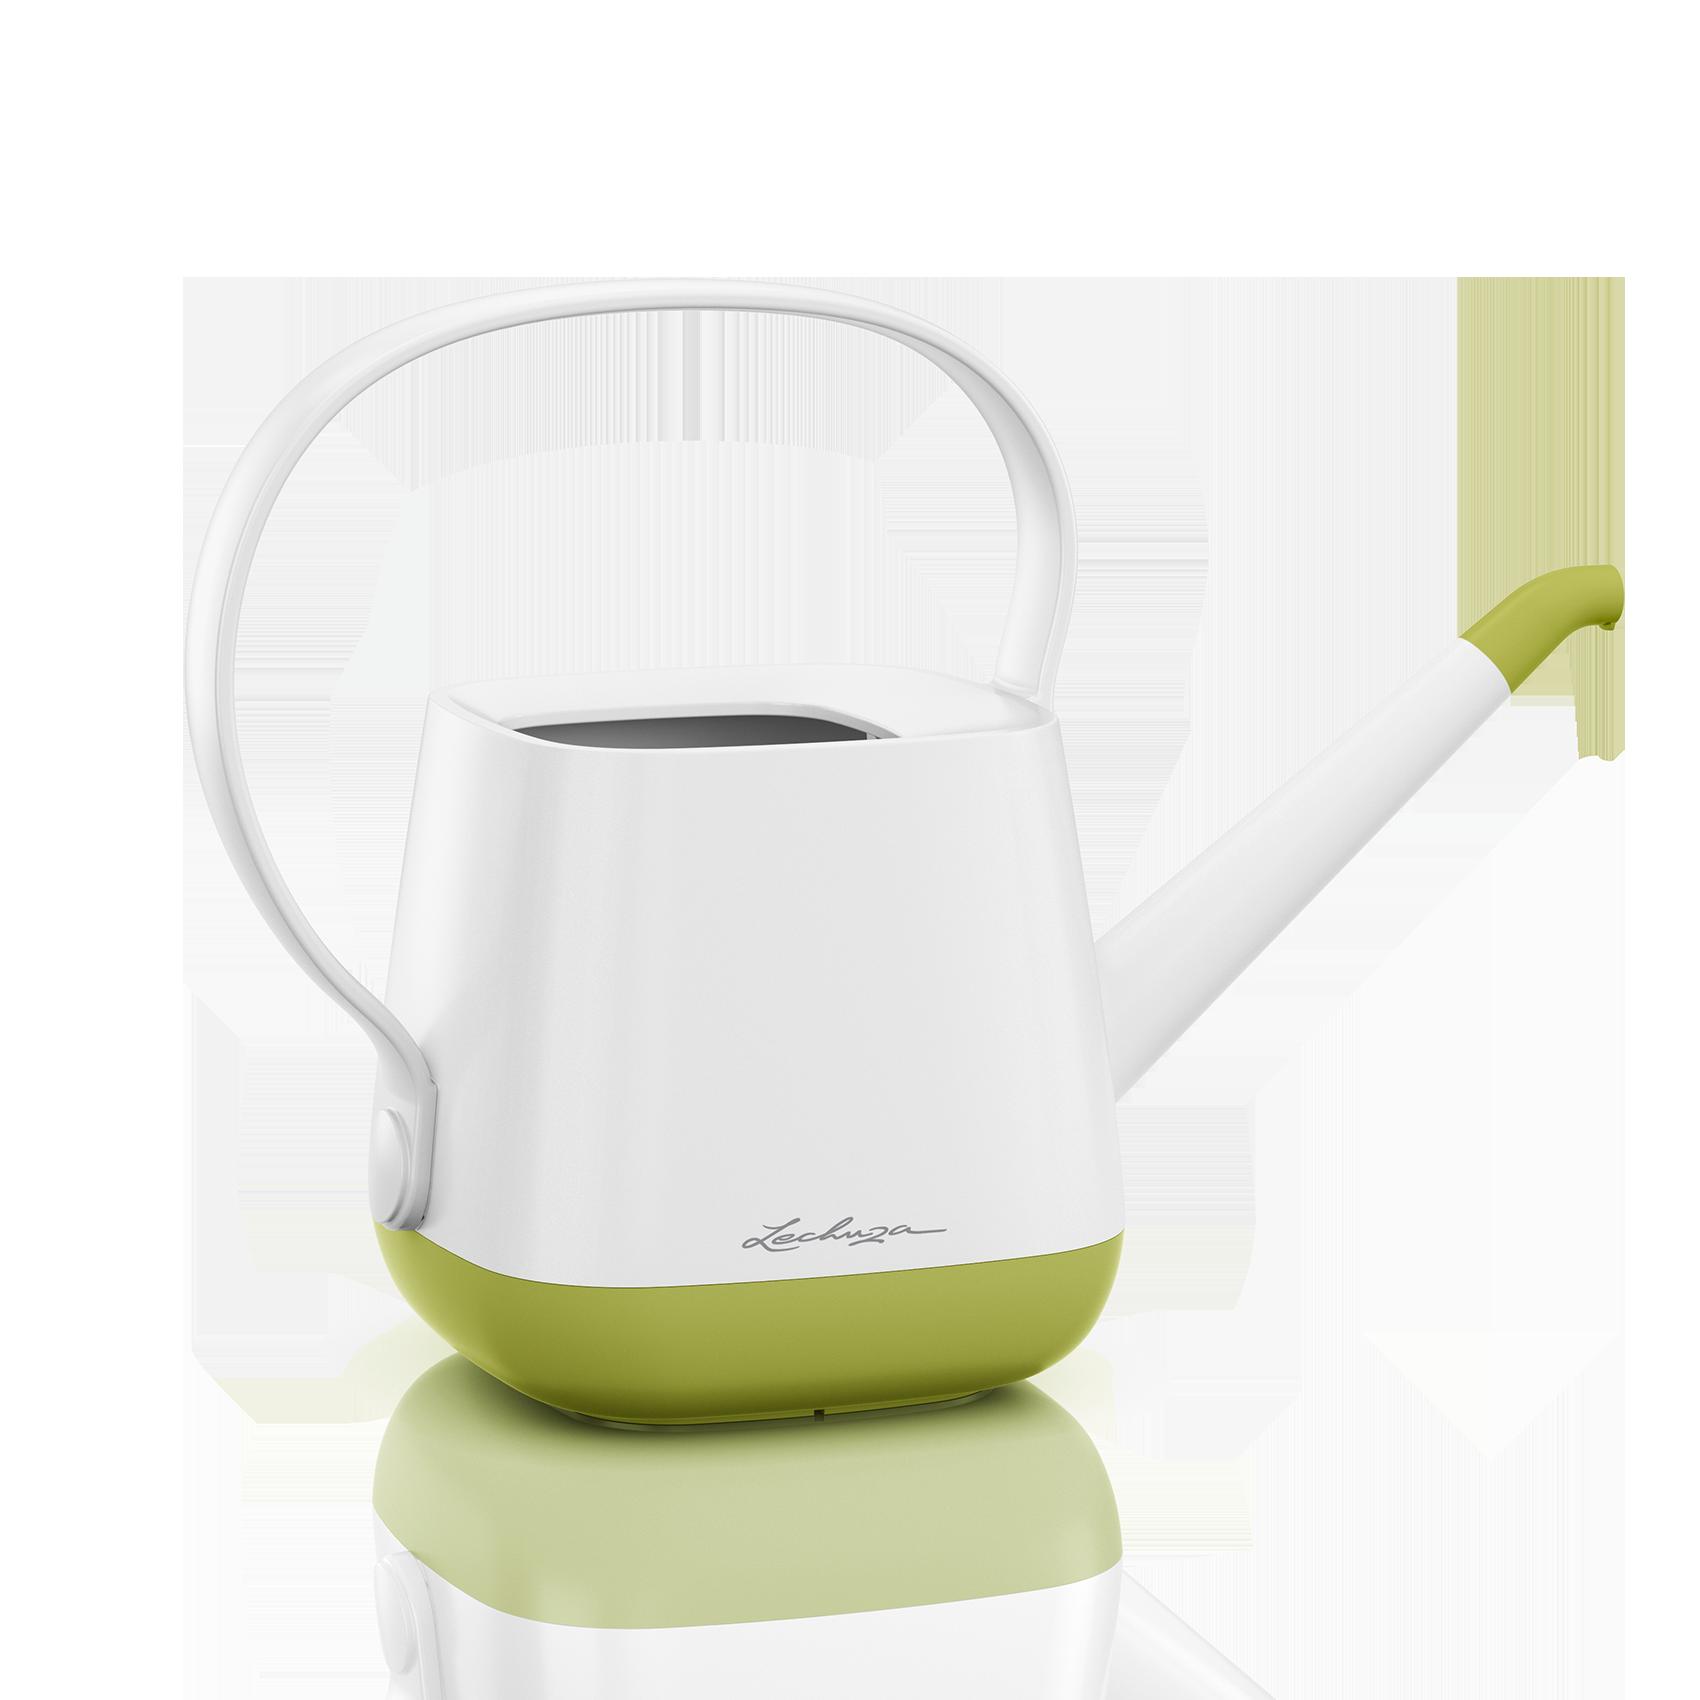 Arrosoir YULA blanc/vert pistache satiné